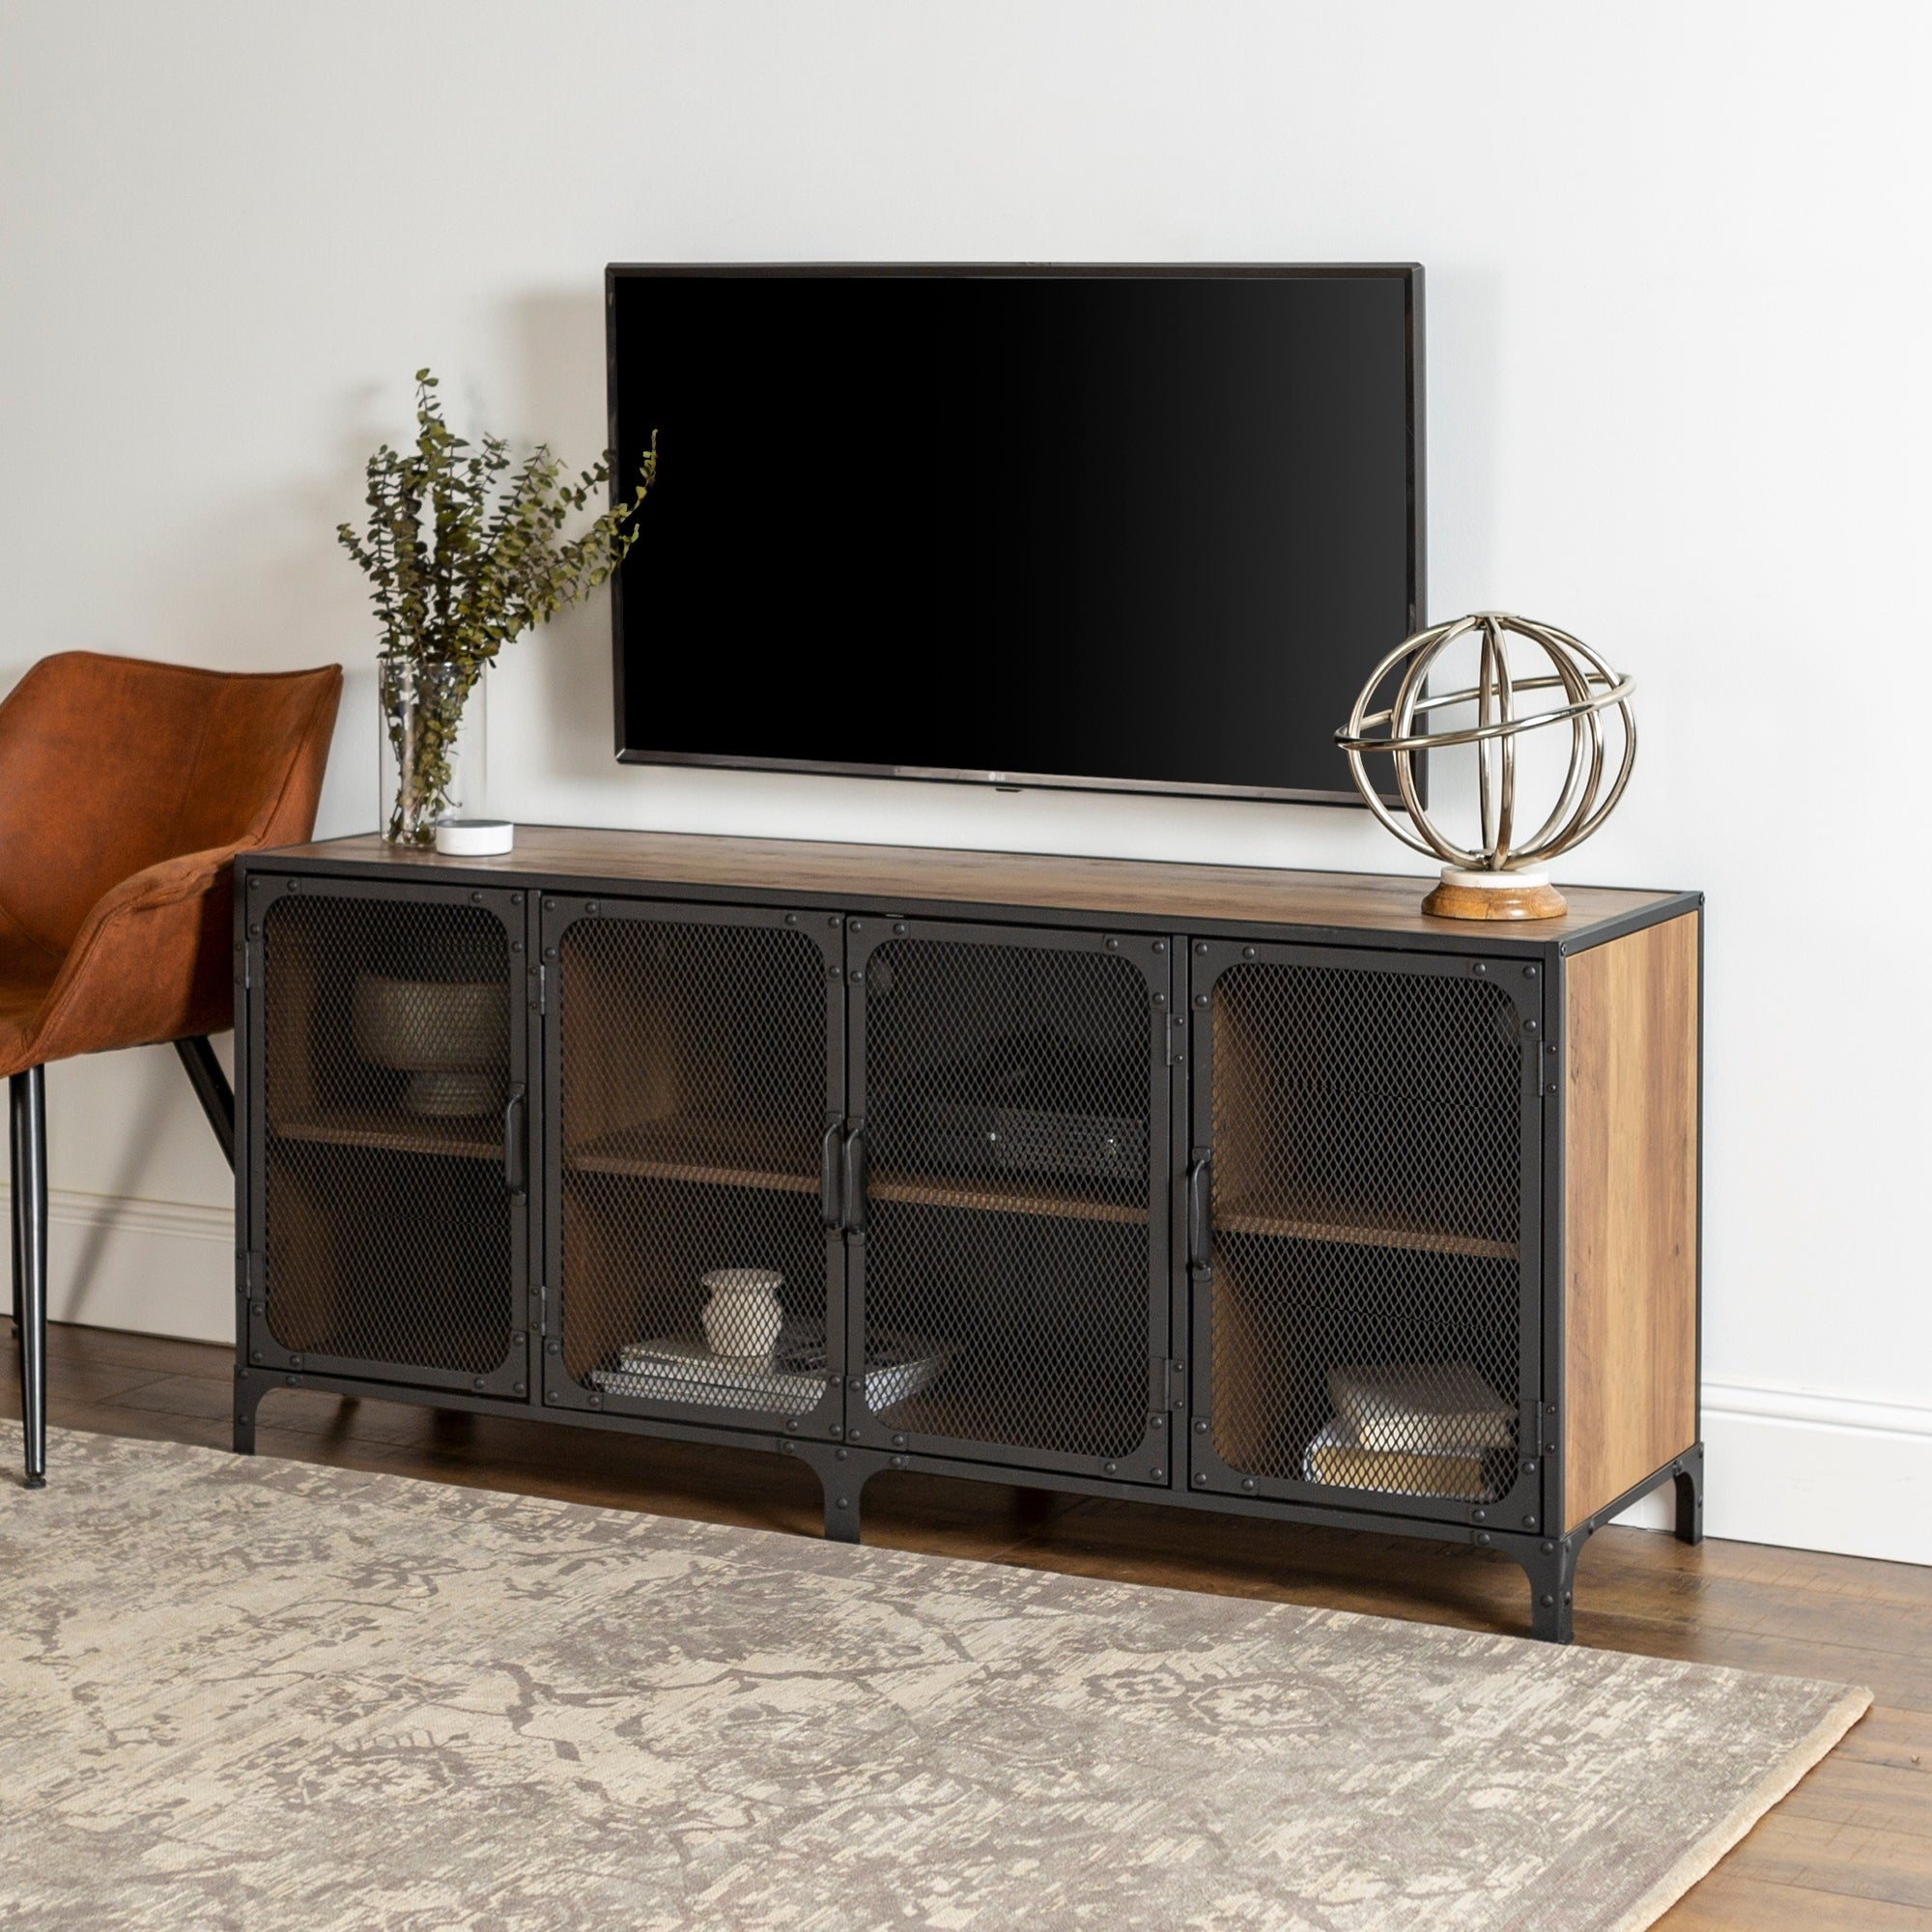 release date 9076a 64153 Carbon Loft Pierpont Mesh Door Industrial TV Stand Console - 60 x 16 x 26h